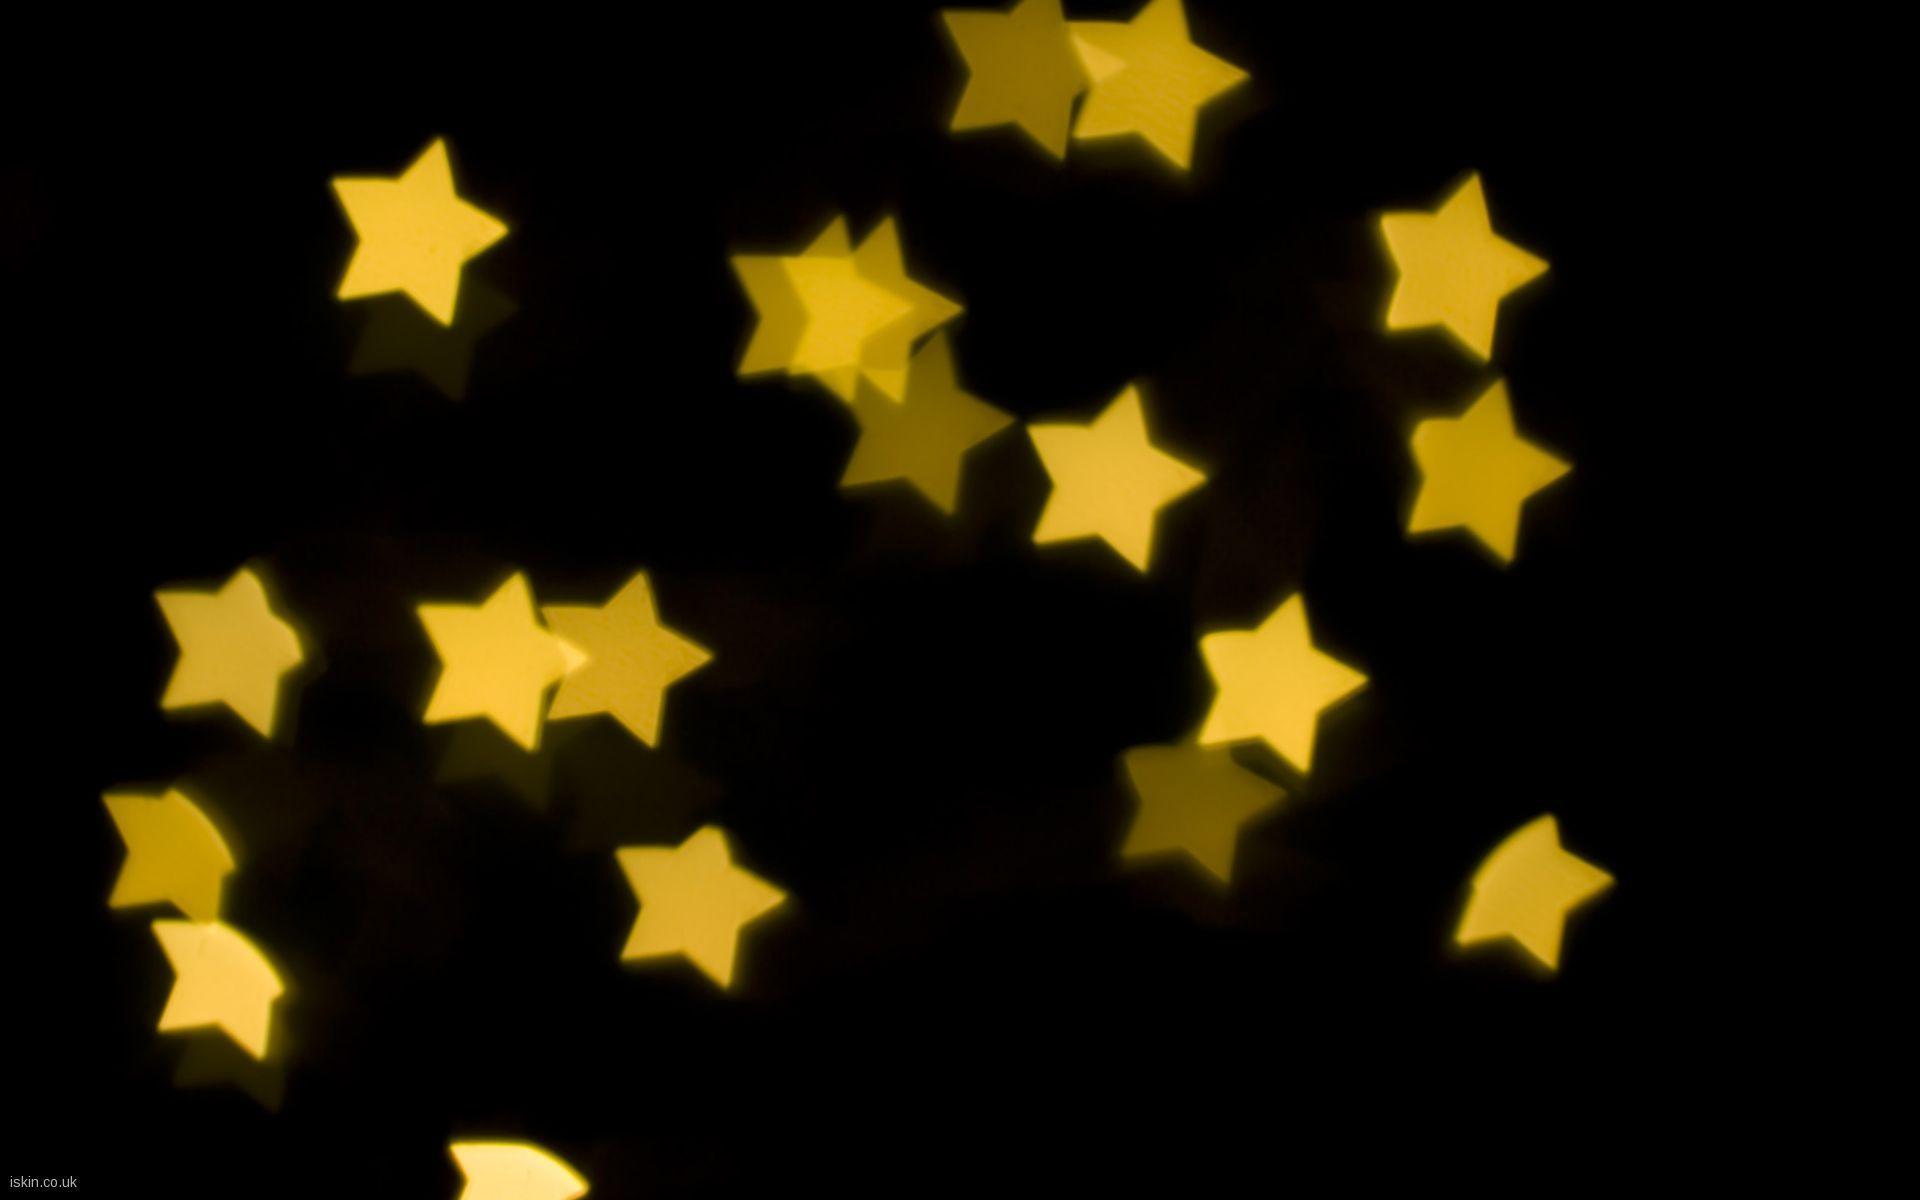 Aesthetic Yellow Stars Wallpaper In 2020 Aesthetic Wallpapers Yellow Aesthetic Baby Girl Wallpaper